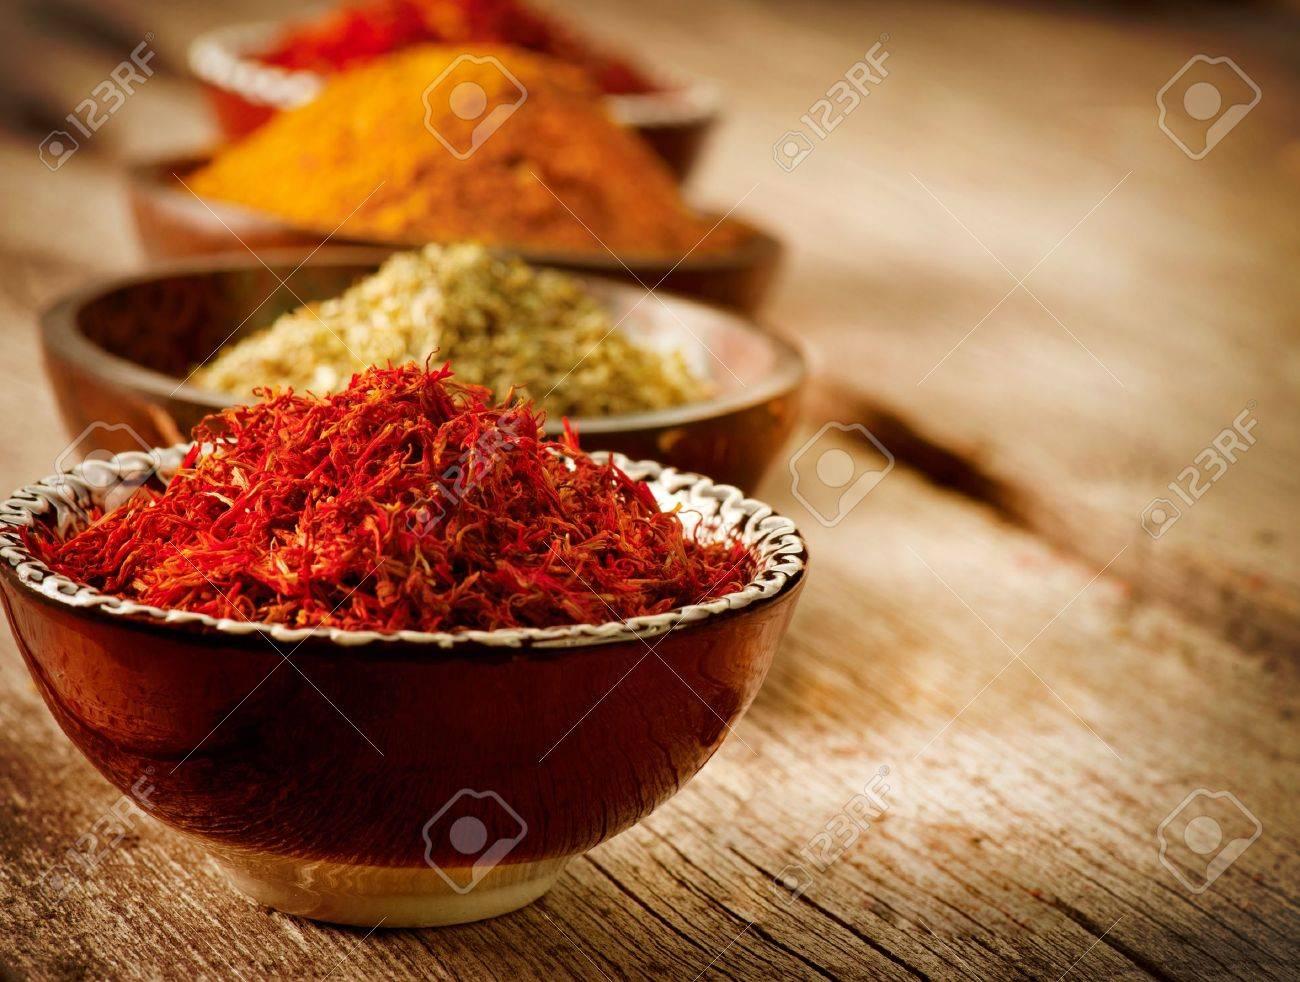 Spices Curry, Saffron, Turmeric - 18696594